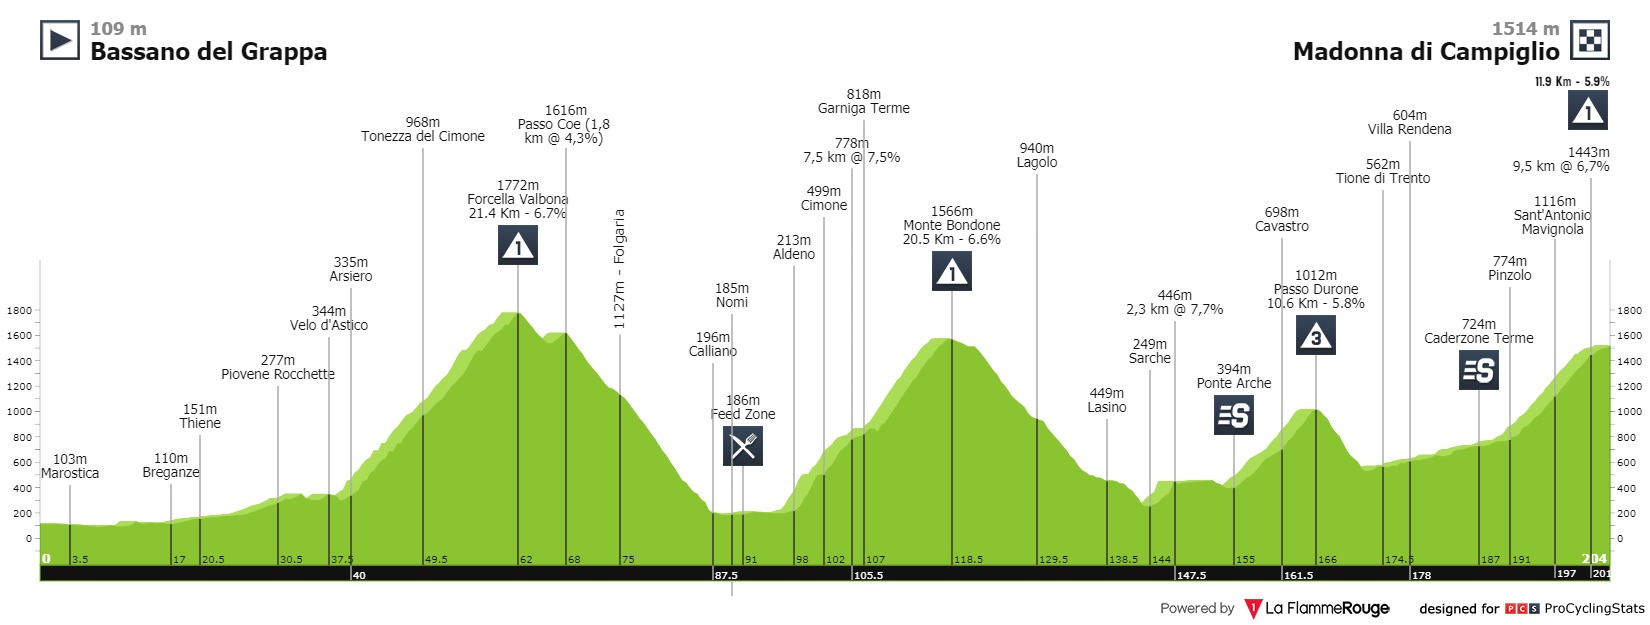 Giro d'Italia Pello Bilbao